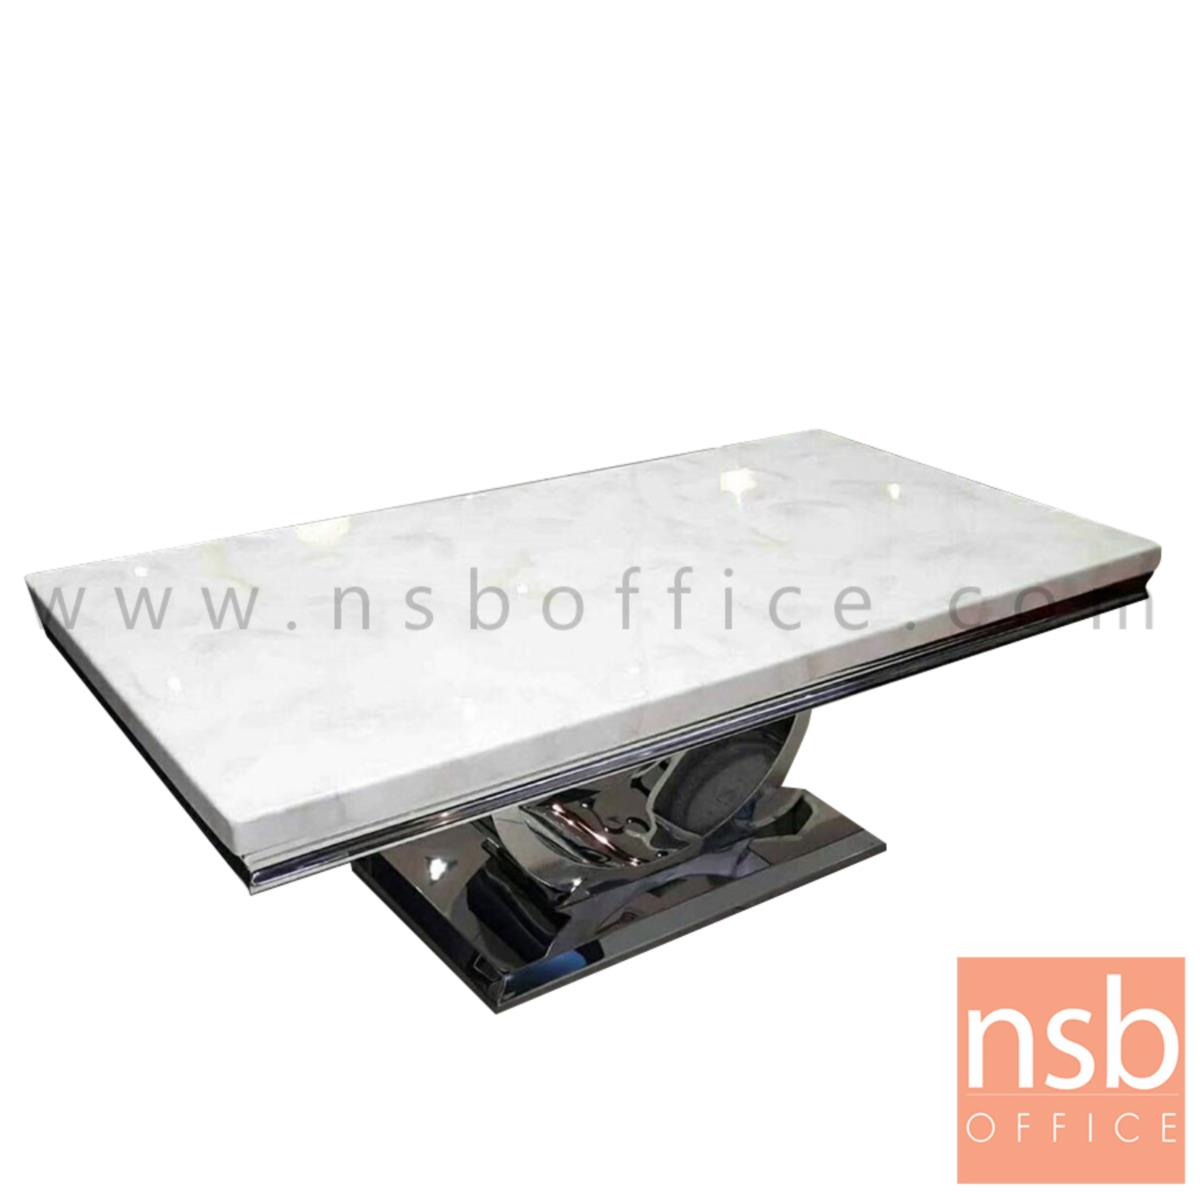 B13A259:โต๊ะกลางหินอ่อน รุ่น Creed (คีด) ขนาด 130W cm. ขาโลหะมันเงา